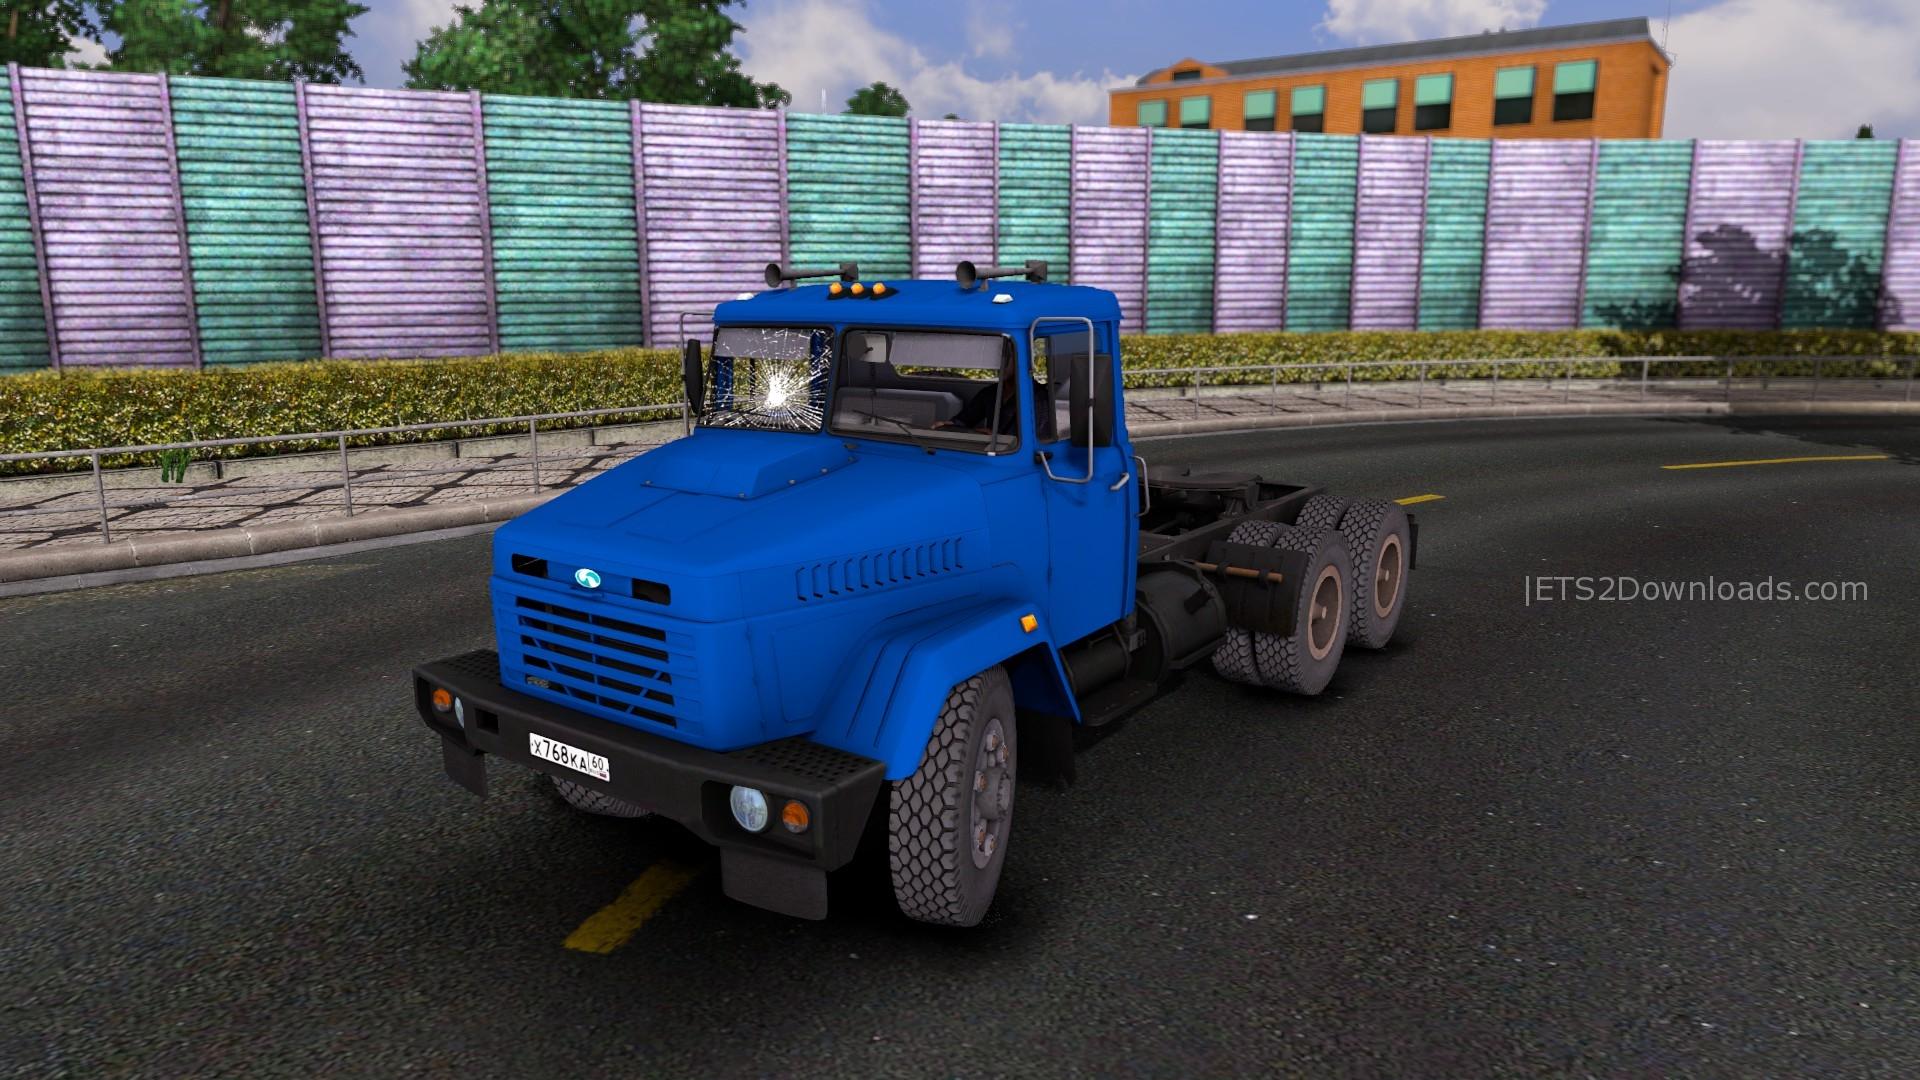 kraz-truck-by-aronson-8